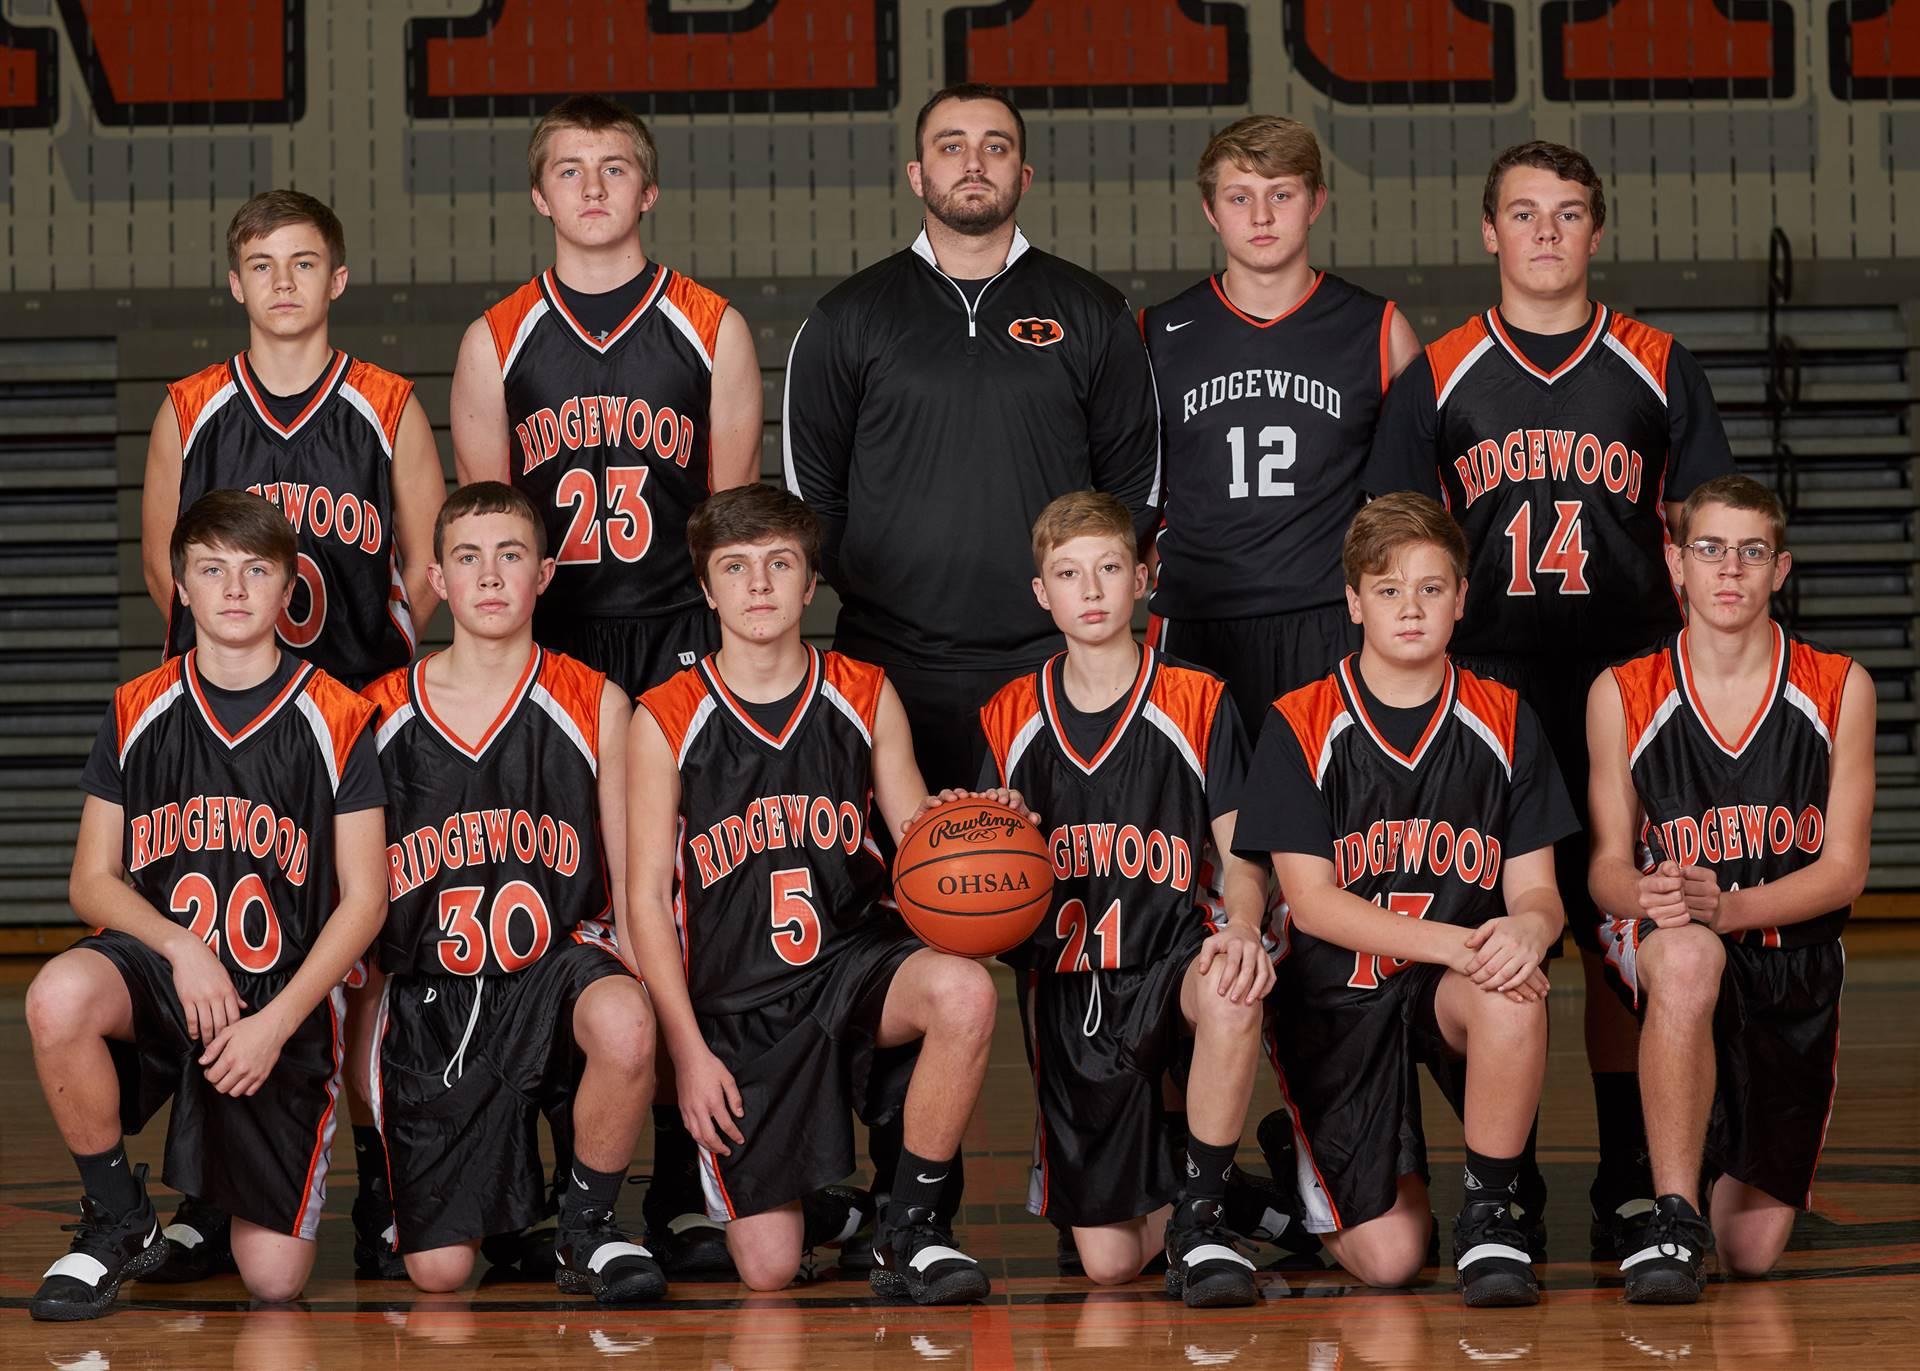 HS Boys Basketball - Freshmen Team